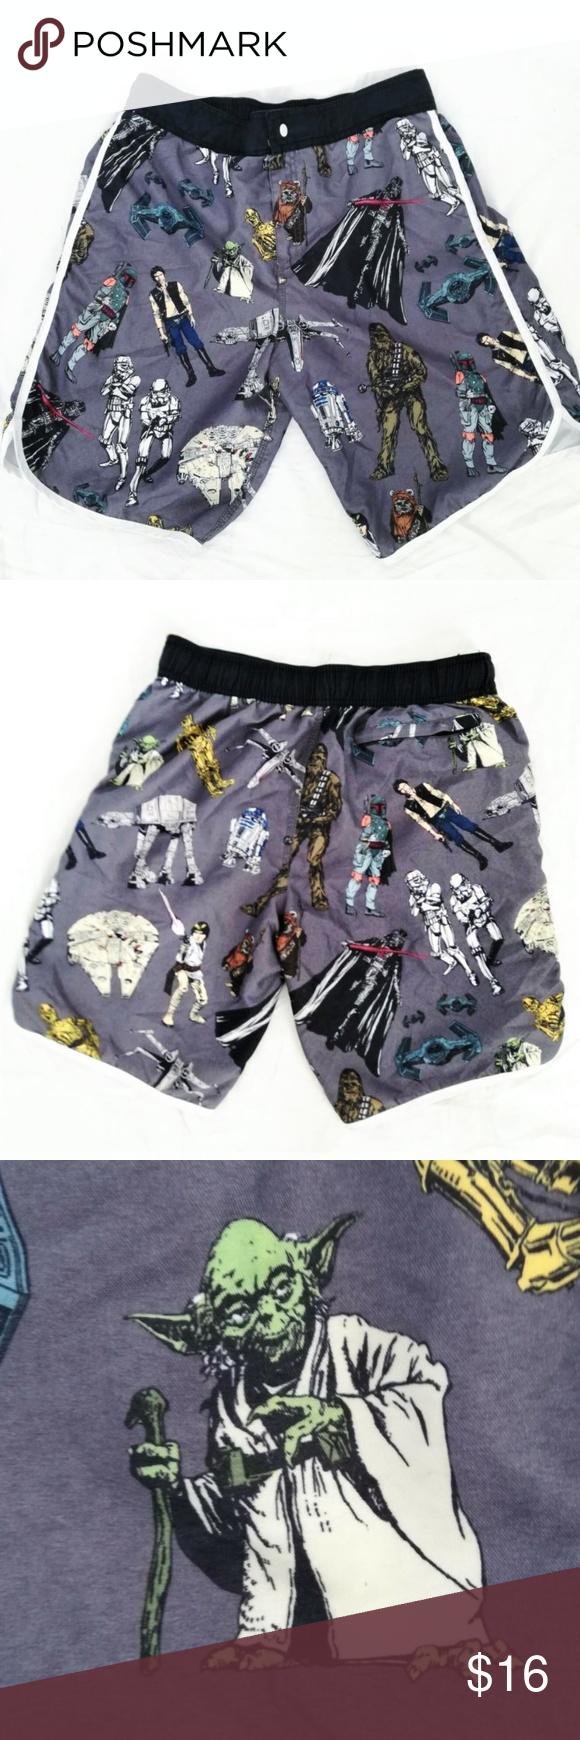 , Men's Star Wars Swim Shorts/Board Shorts EUC Great Star Wars swim trunks/board shorts with all the male characters printed on them. Three pockets, one…, My Pop Star Kda Blog, My Pop Star Kda Blog